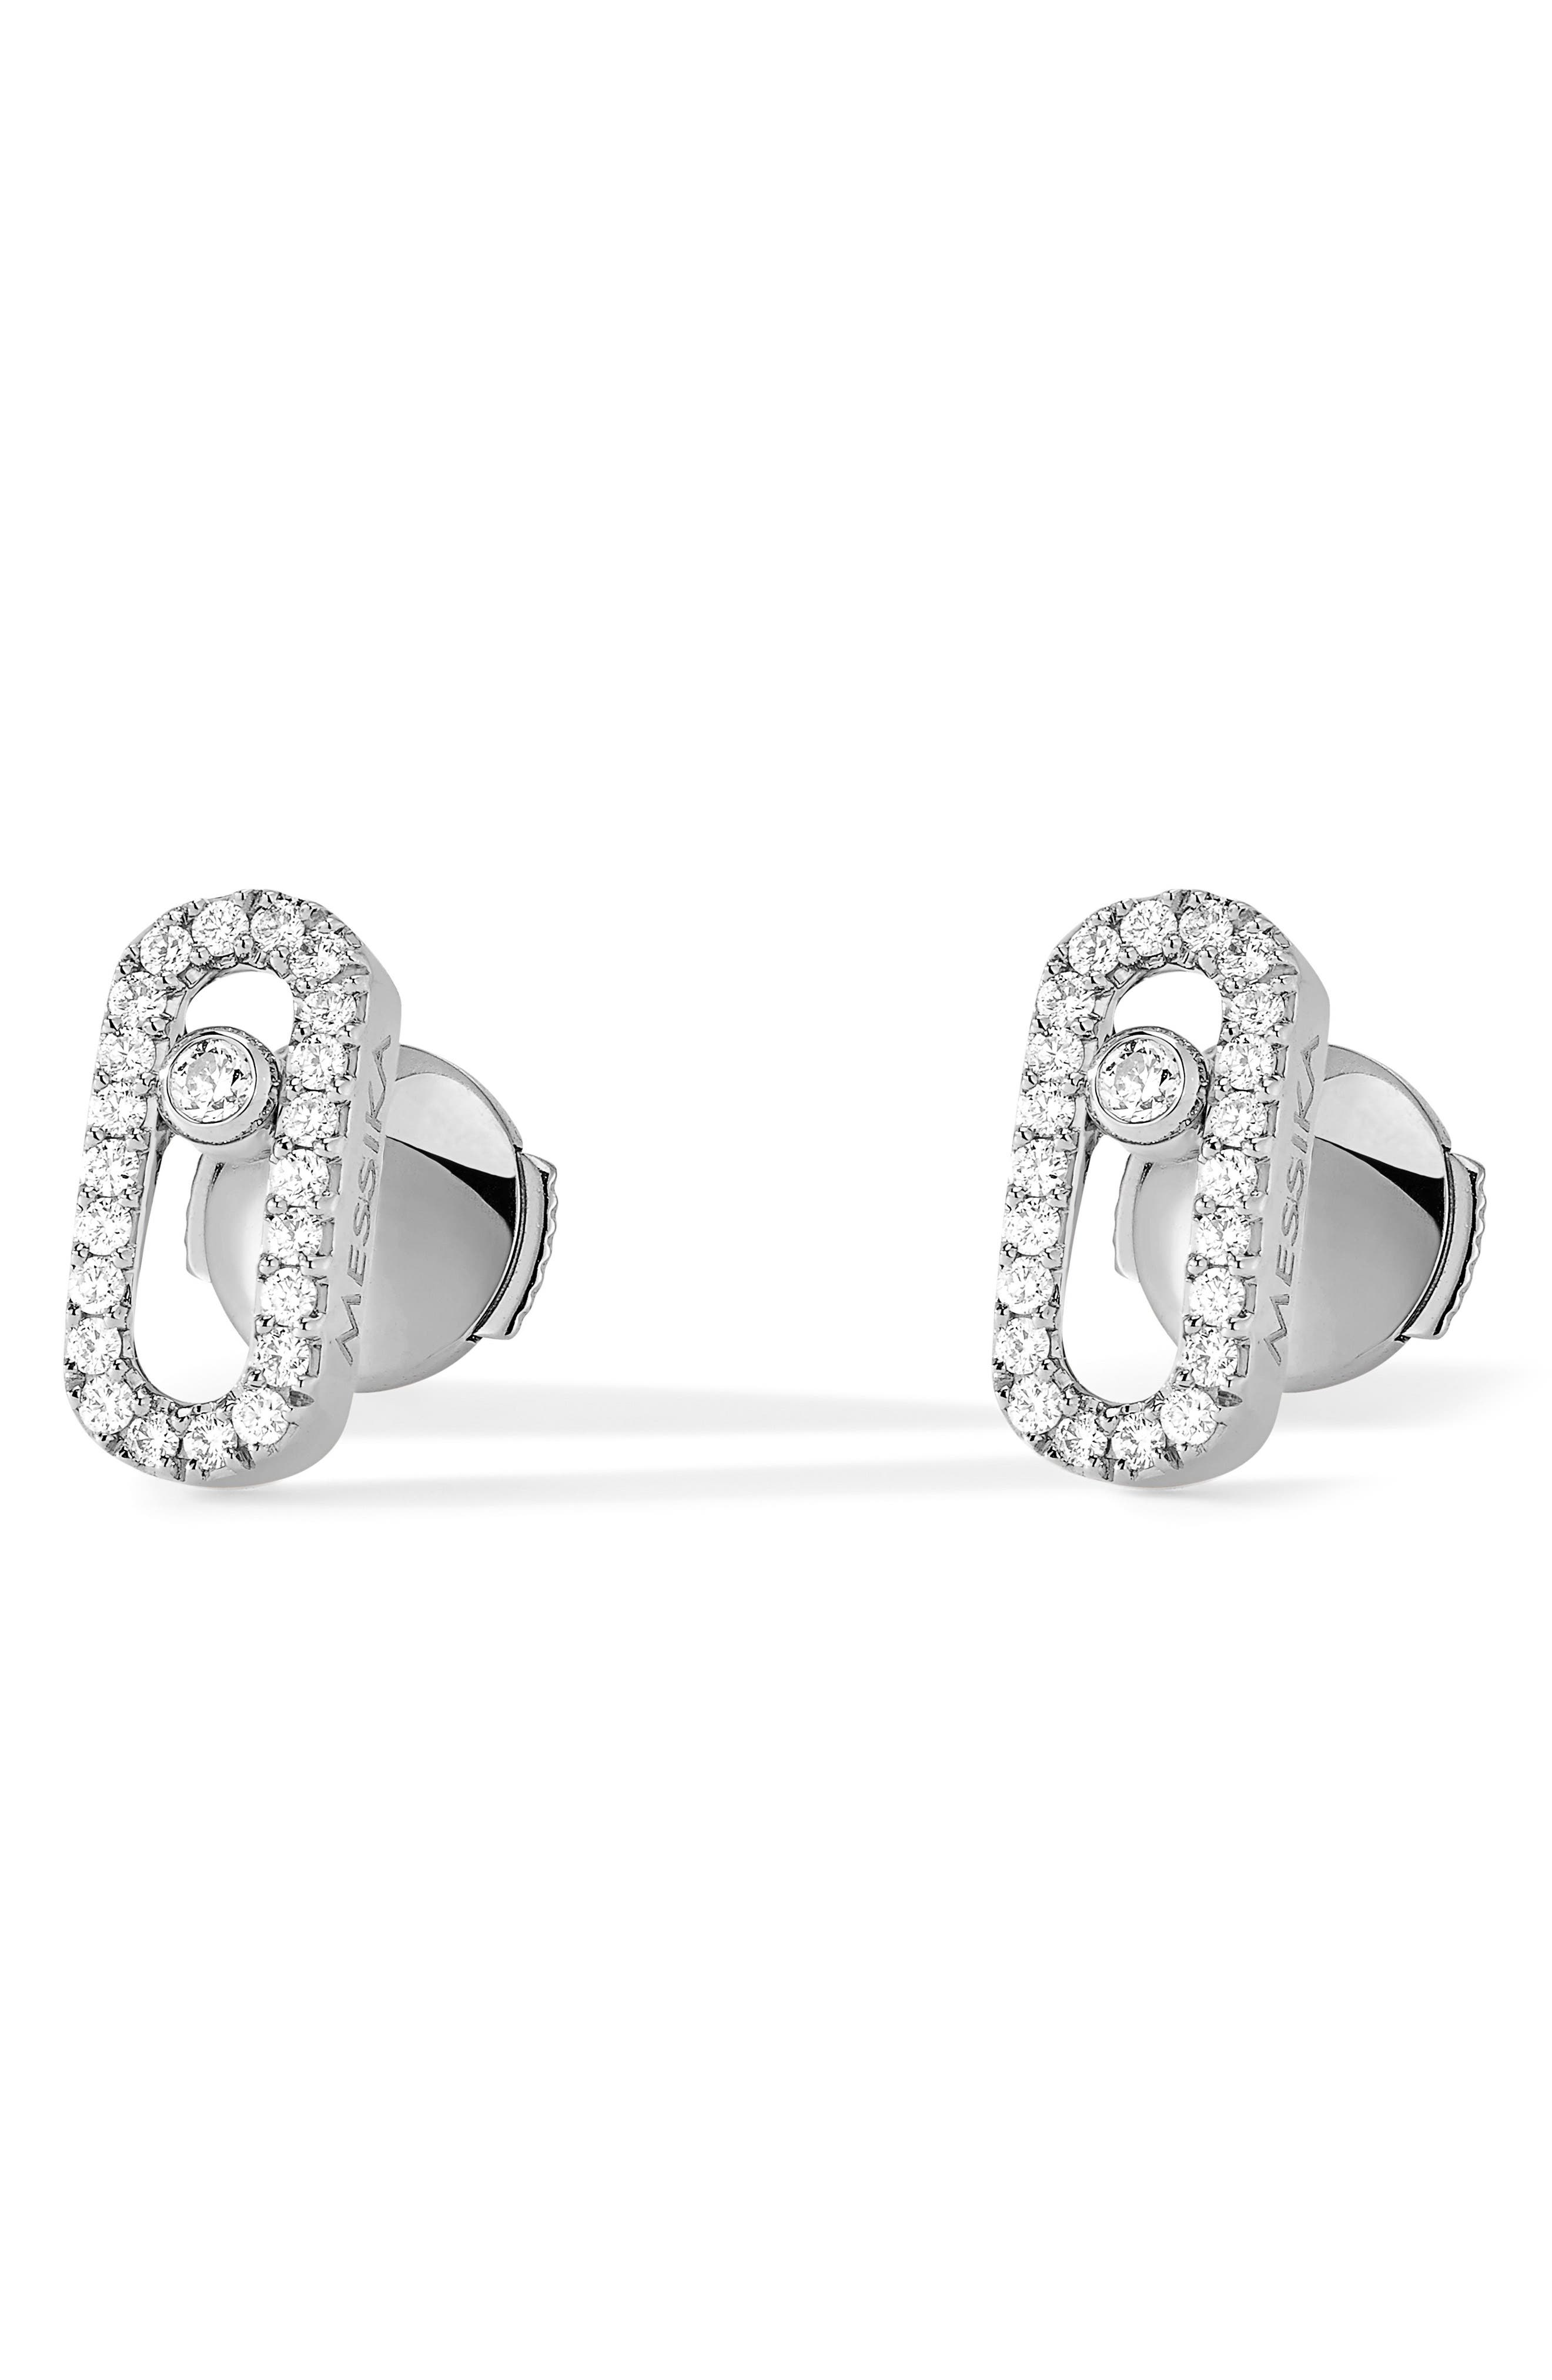 Move Uno Pavé Diamond Stud Earrings,                             Main thumbnail 1, color,                             WHITE GOLD